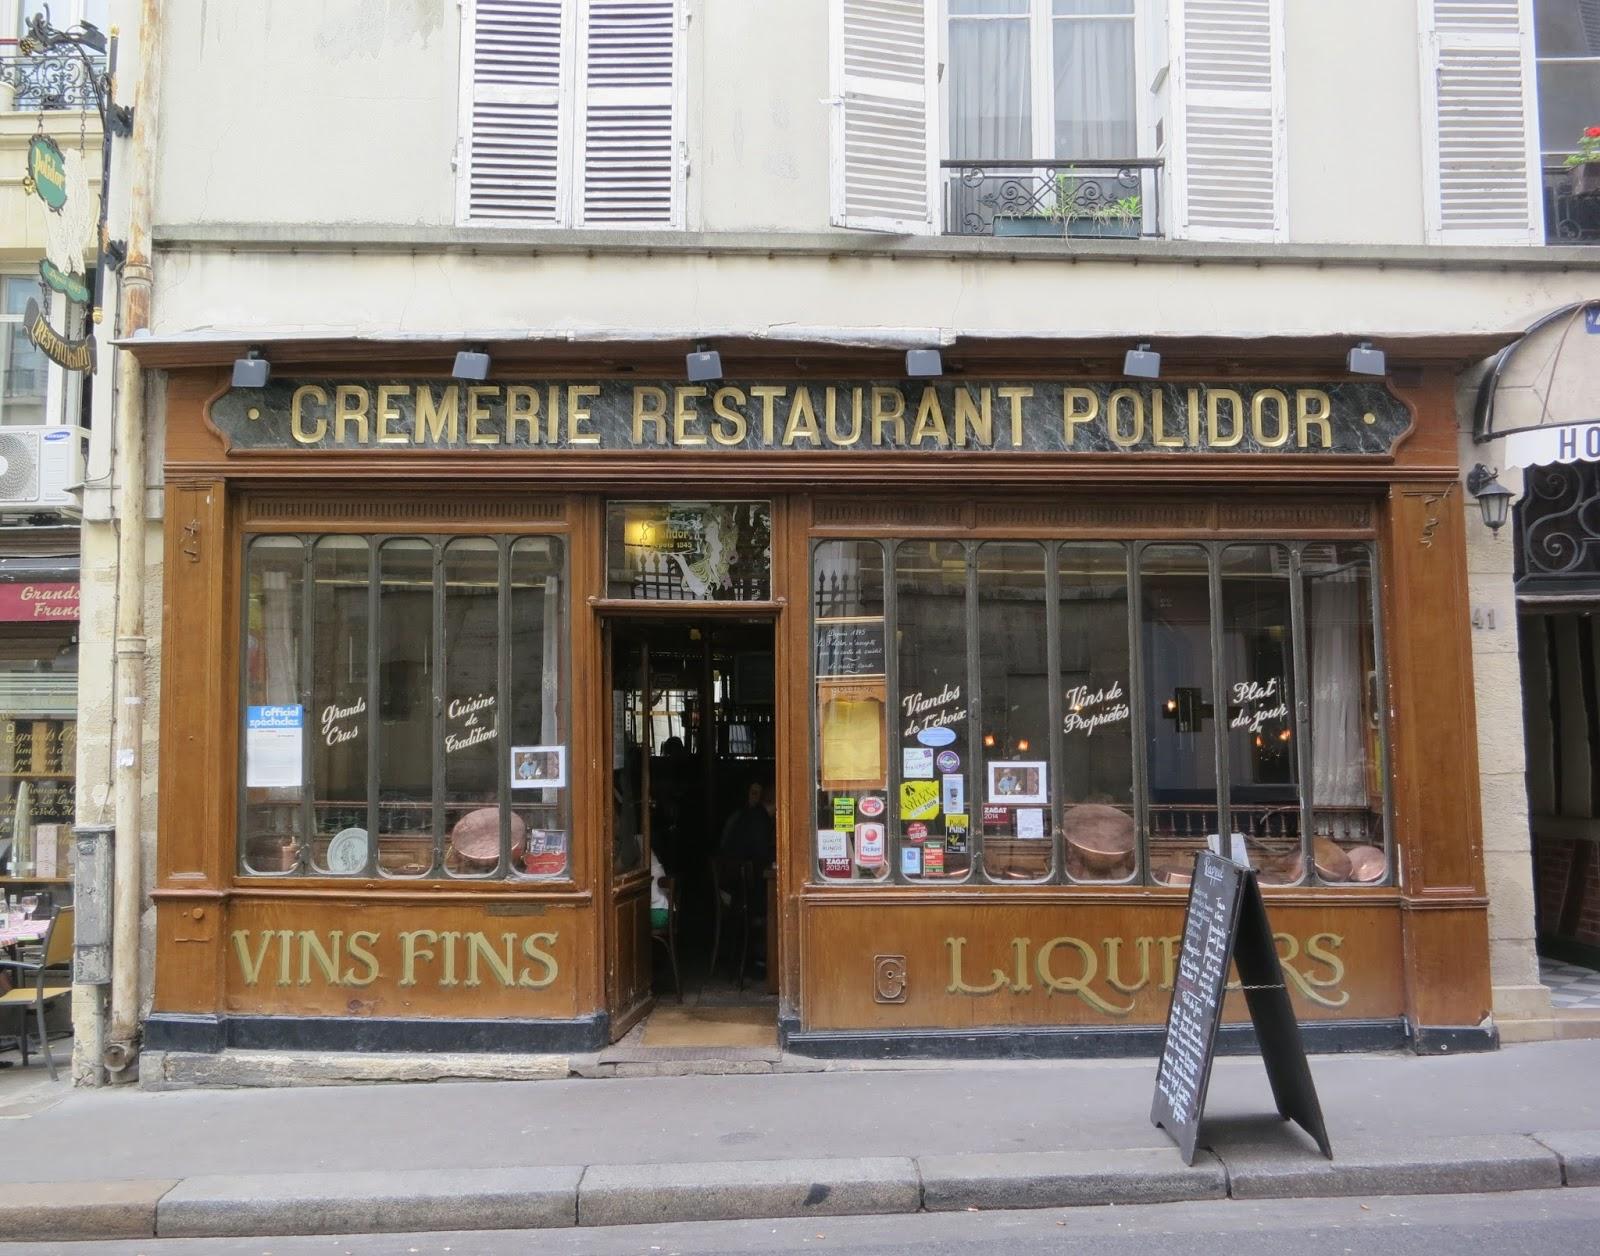 Where Is Fatboy Paris Cremerie Restaurant Polidor